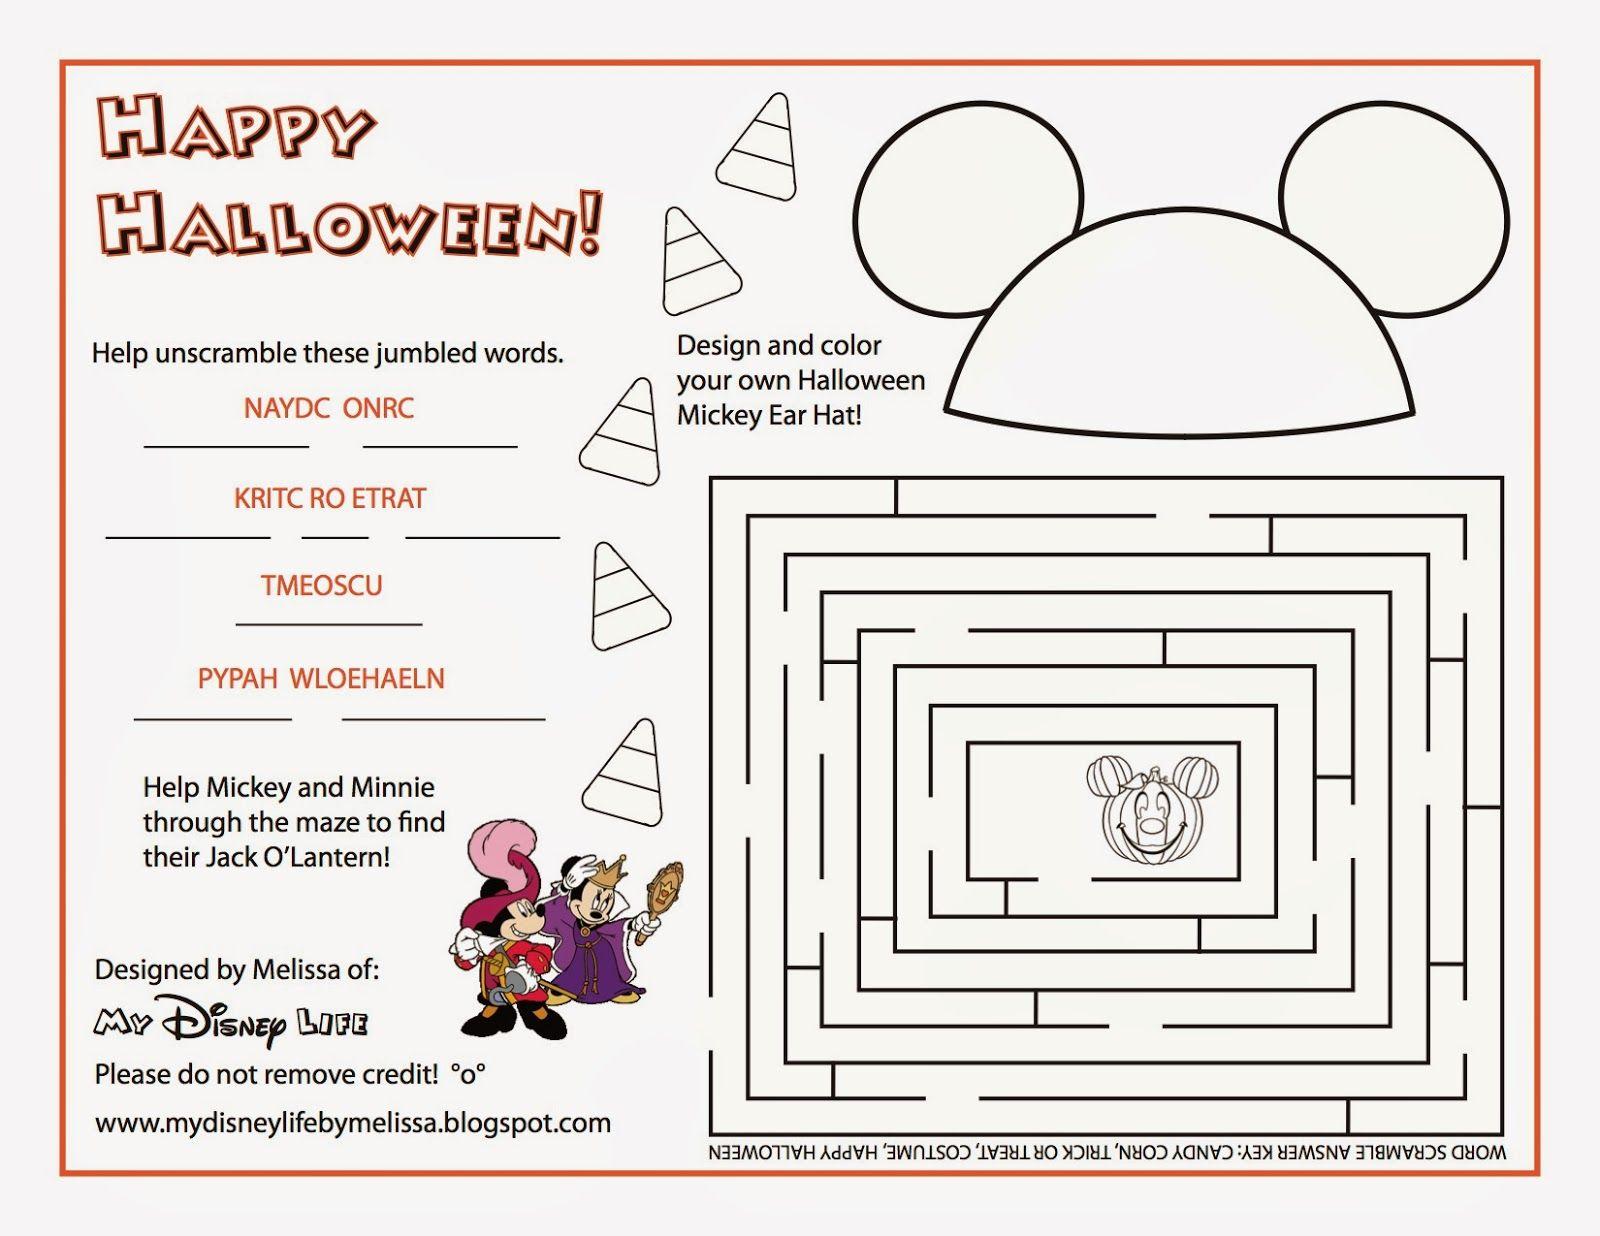 My Disney Life Free Printable Halloween Activity Sheet